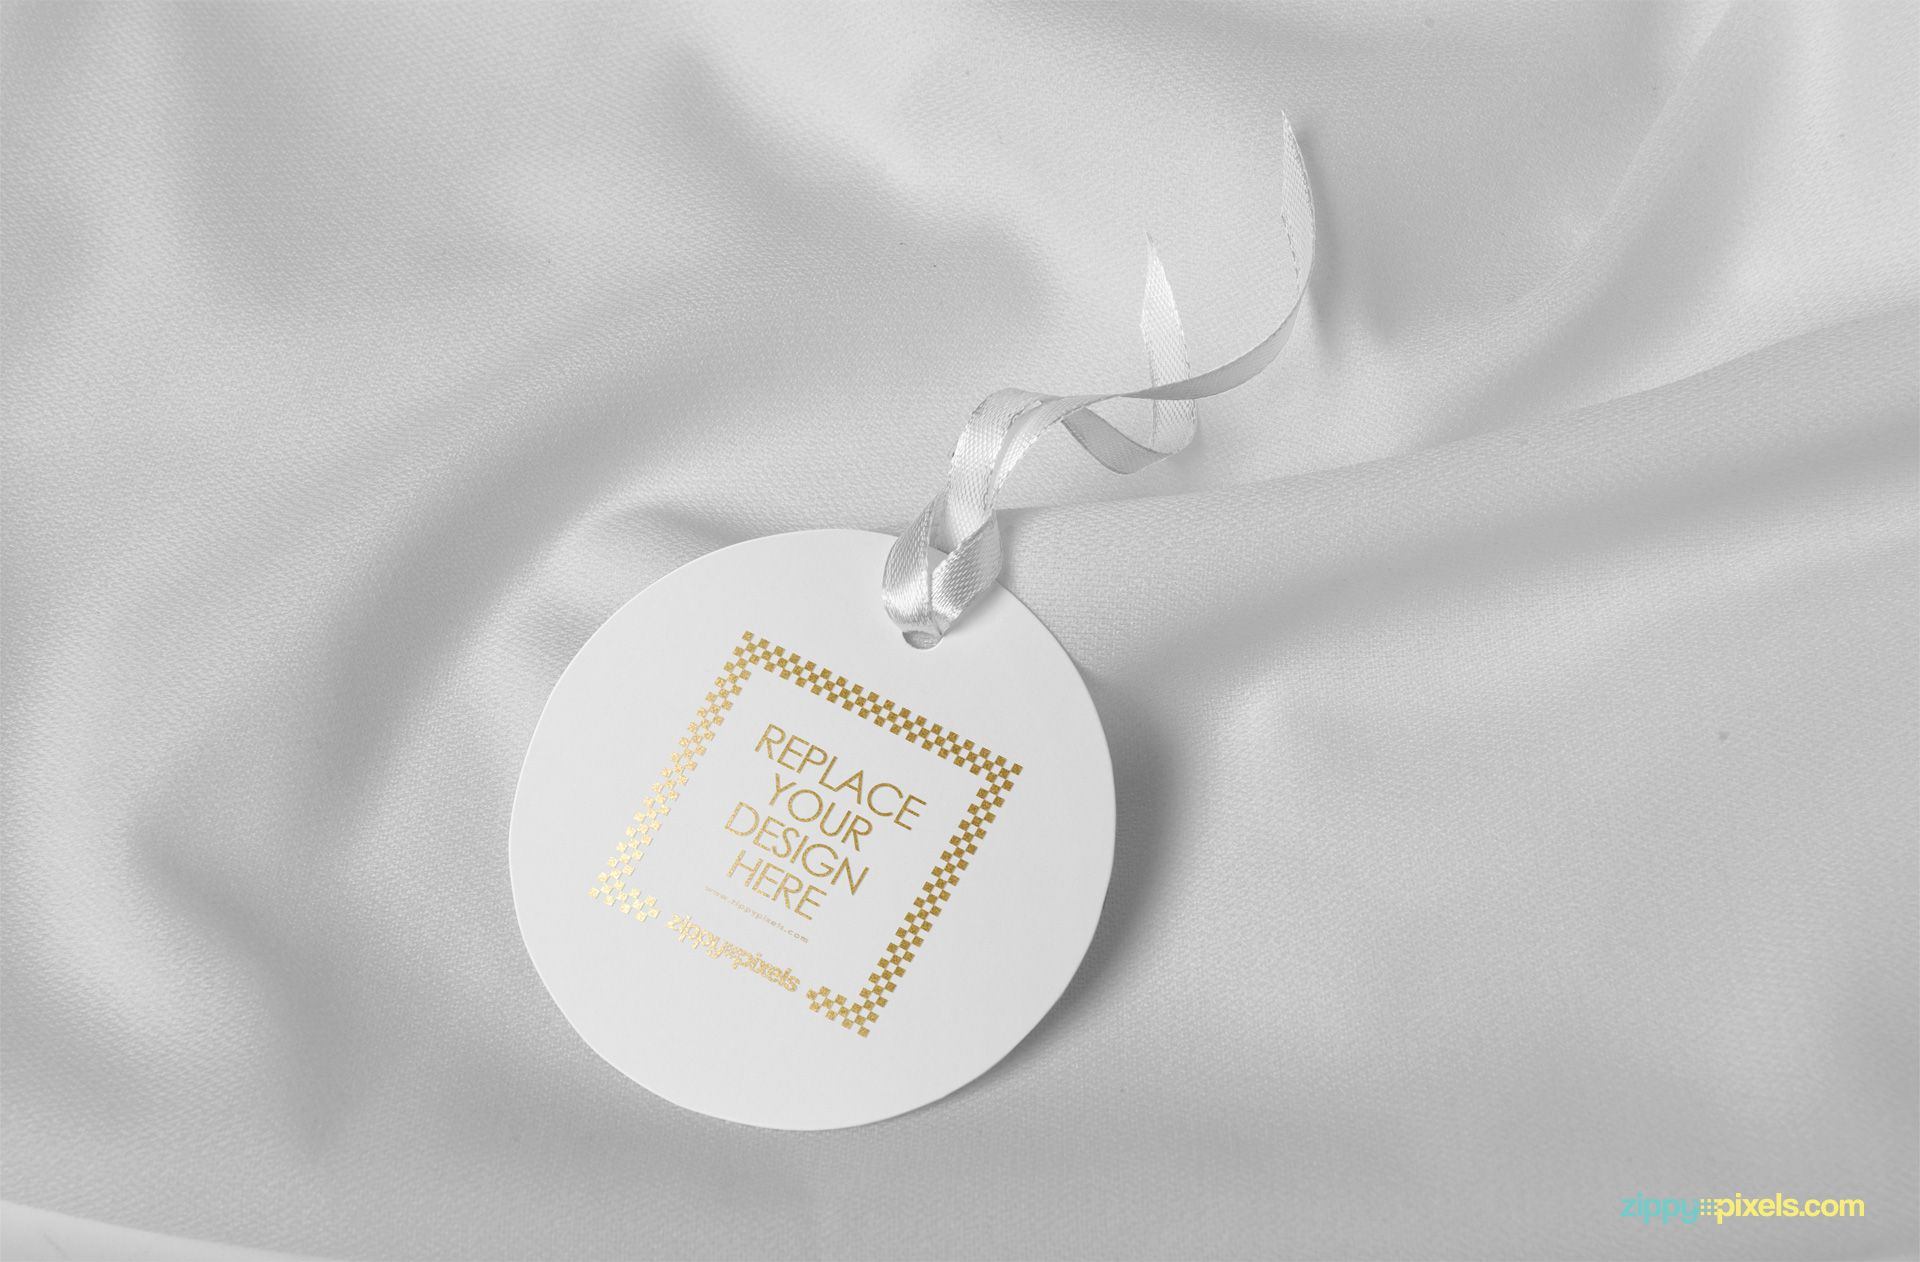 Download Free Lavish Tag Mock Up Zippypixels Templates Free Design Design Freebie Clothing Branding Design